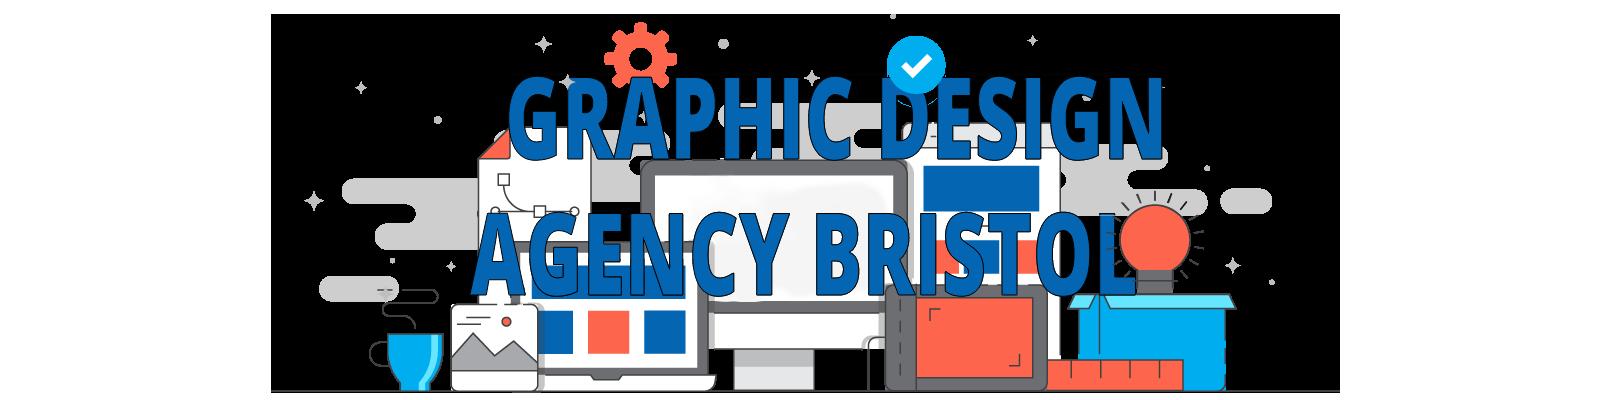 Graphic-Design-Agency-Bristol